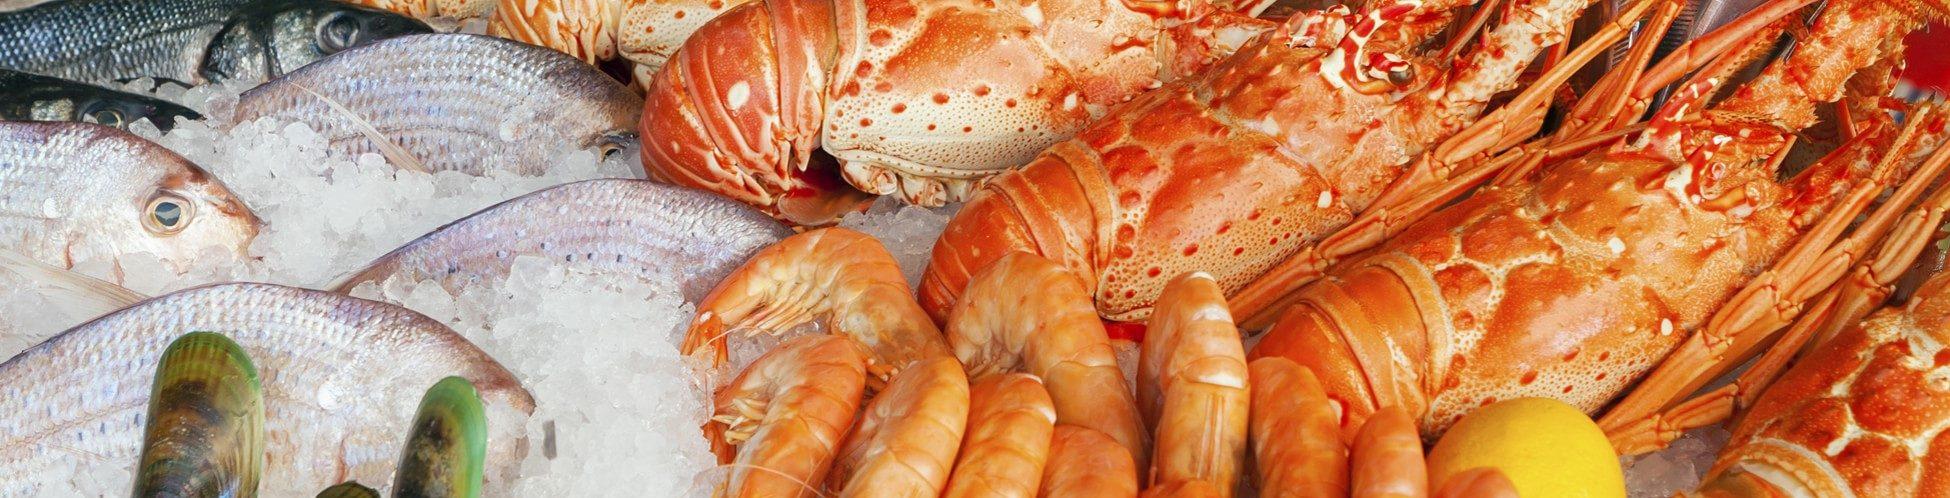 Alexander Miller & Associates | Seafood Division